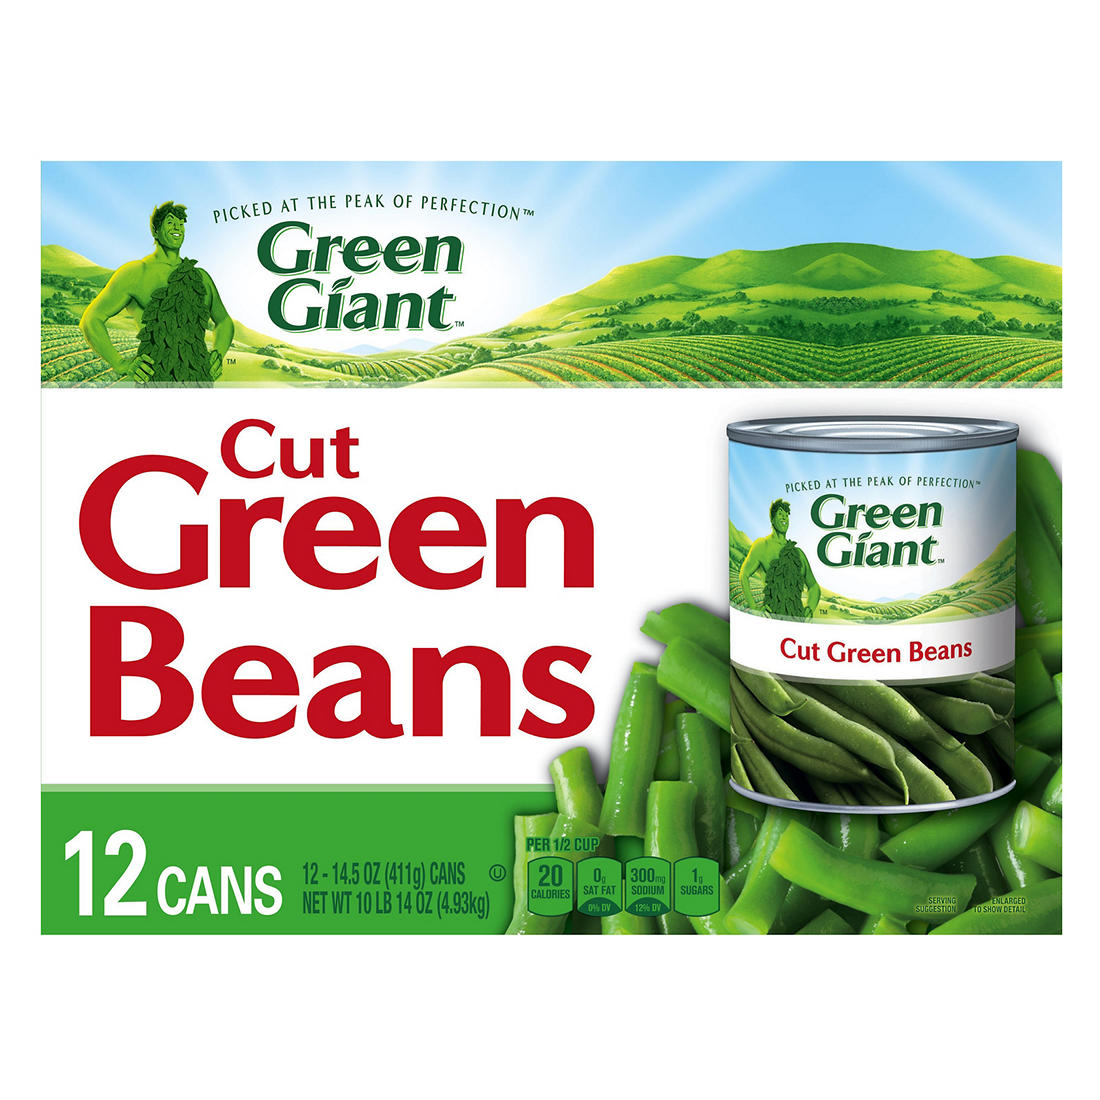 Green Giant Green Beans, 12 ct./14.5 oz